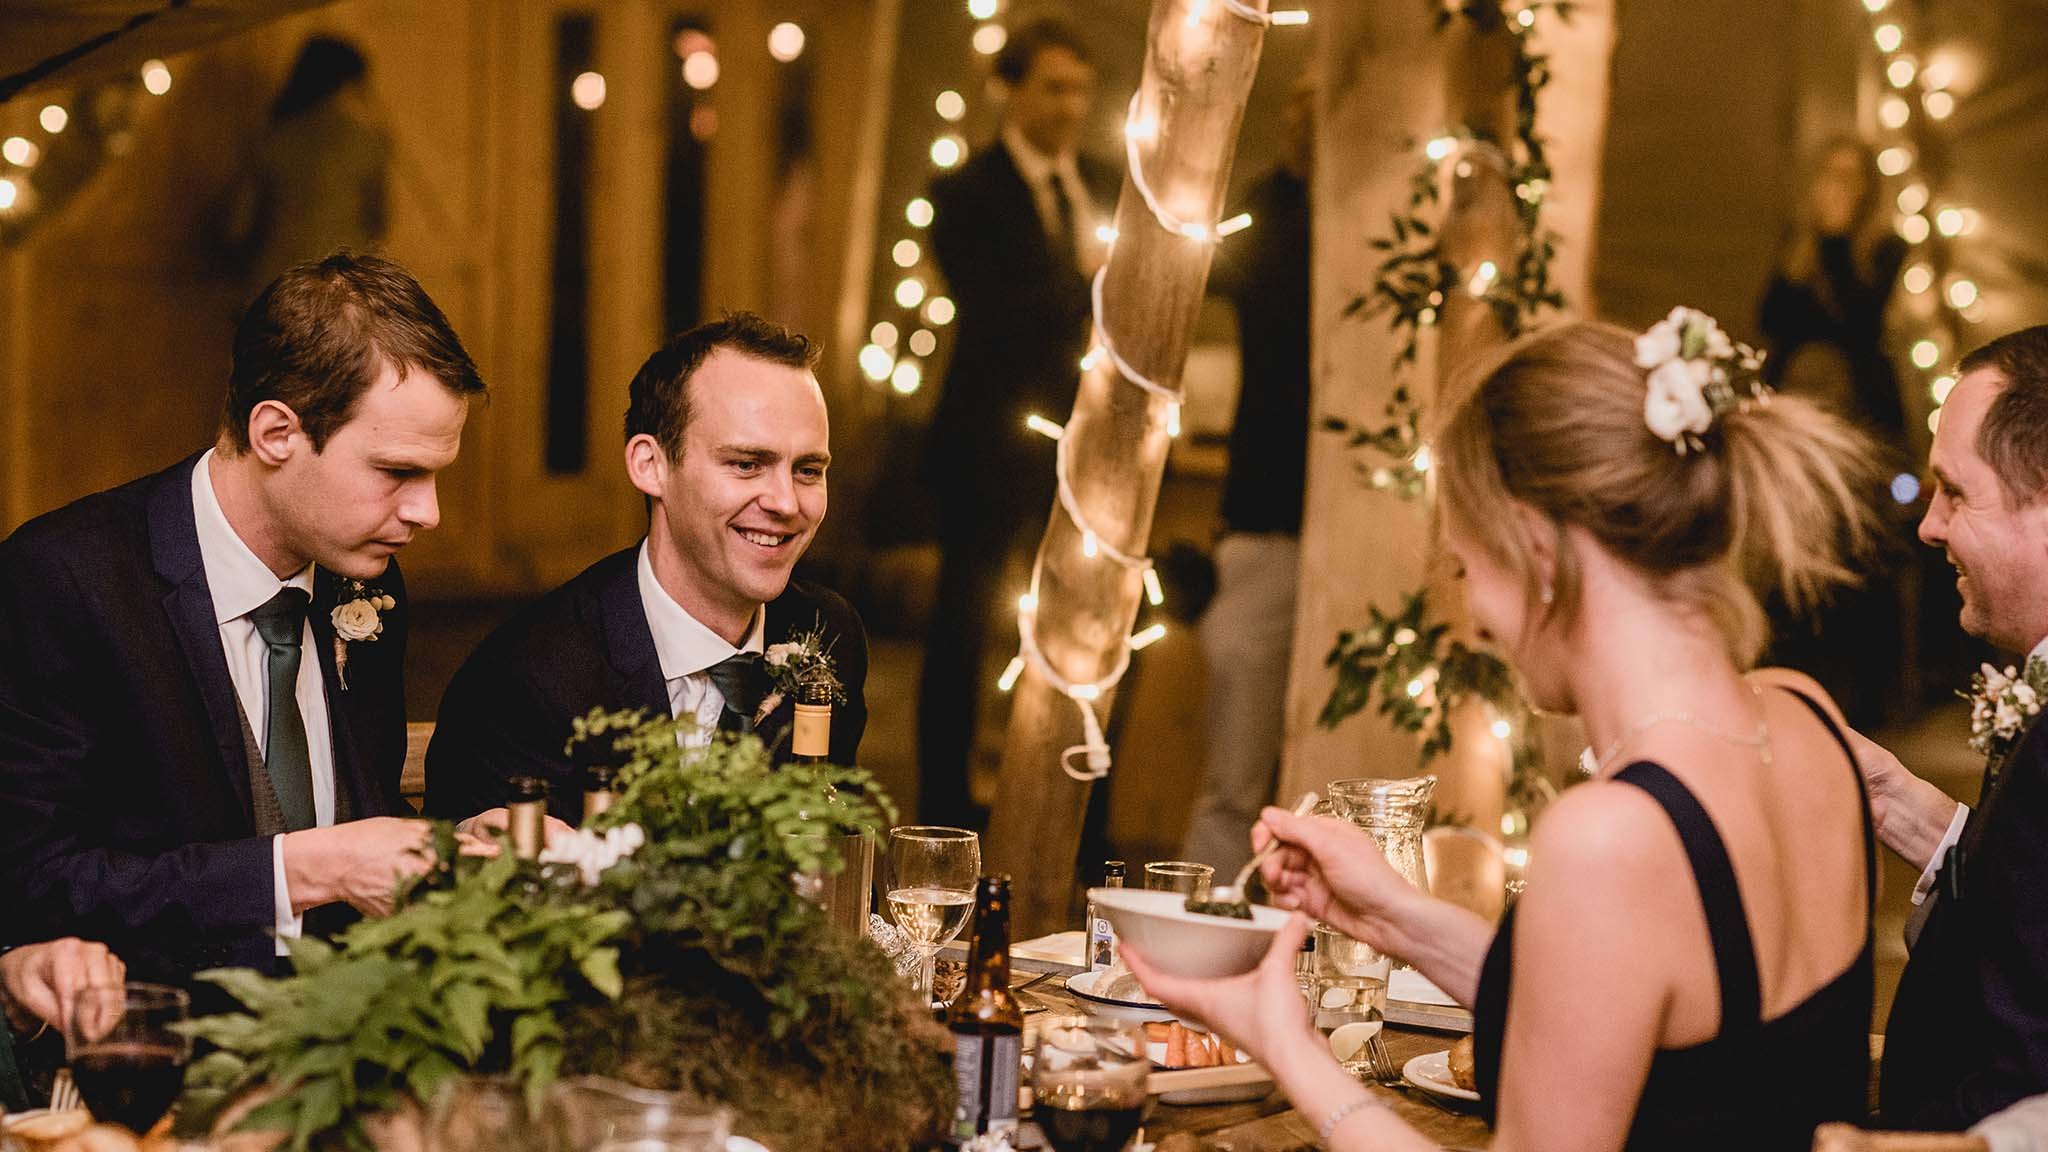 Dartington Hall Weddings: Hospitality